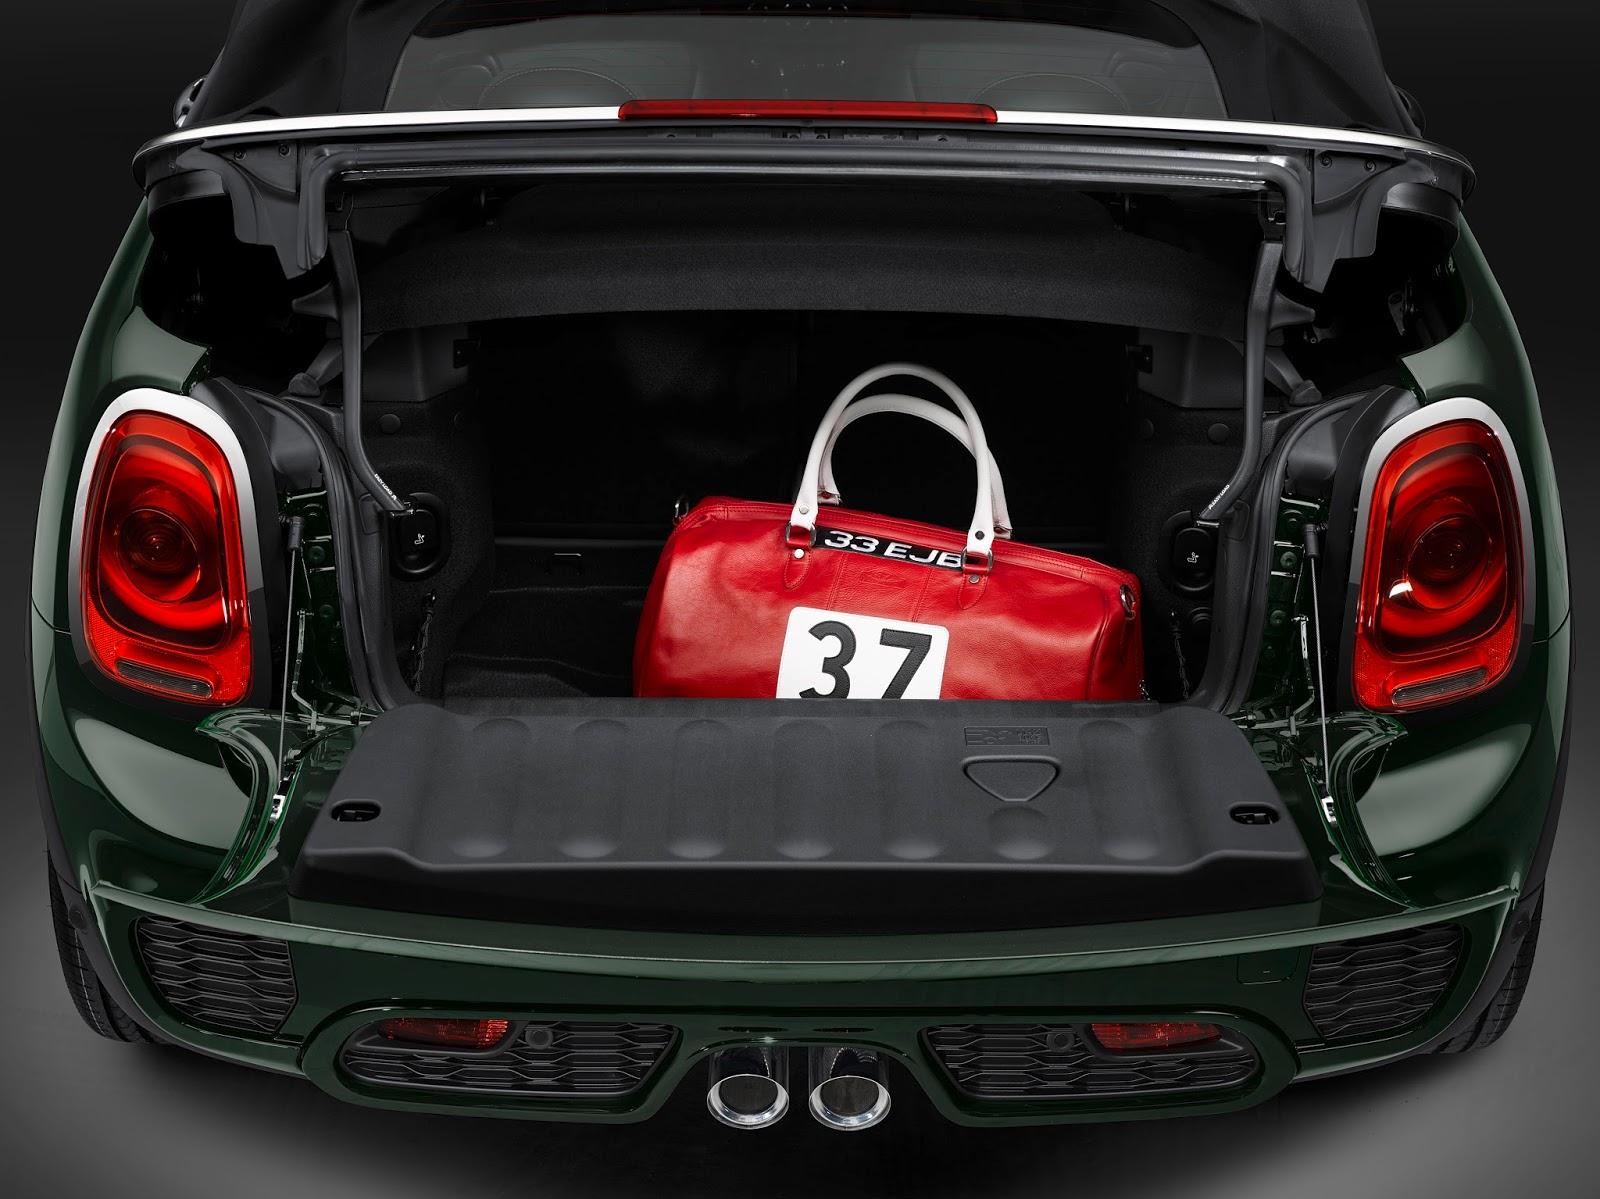 P90206786 highRes Έρχεται το νέο MINI John Cooper Works Cabrio με 231 ίππους